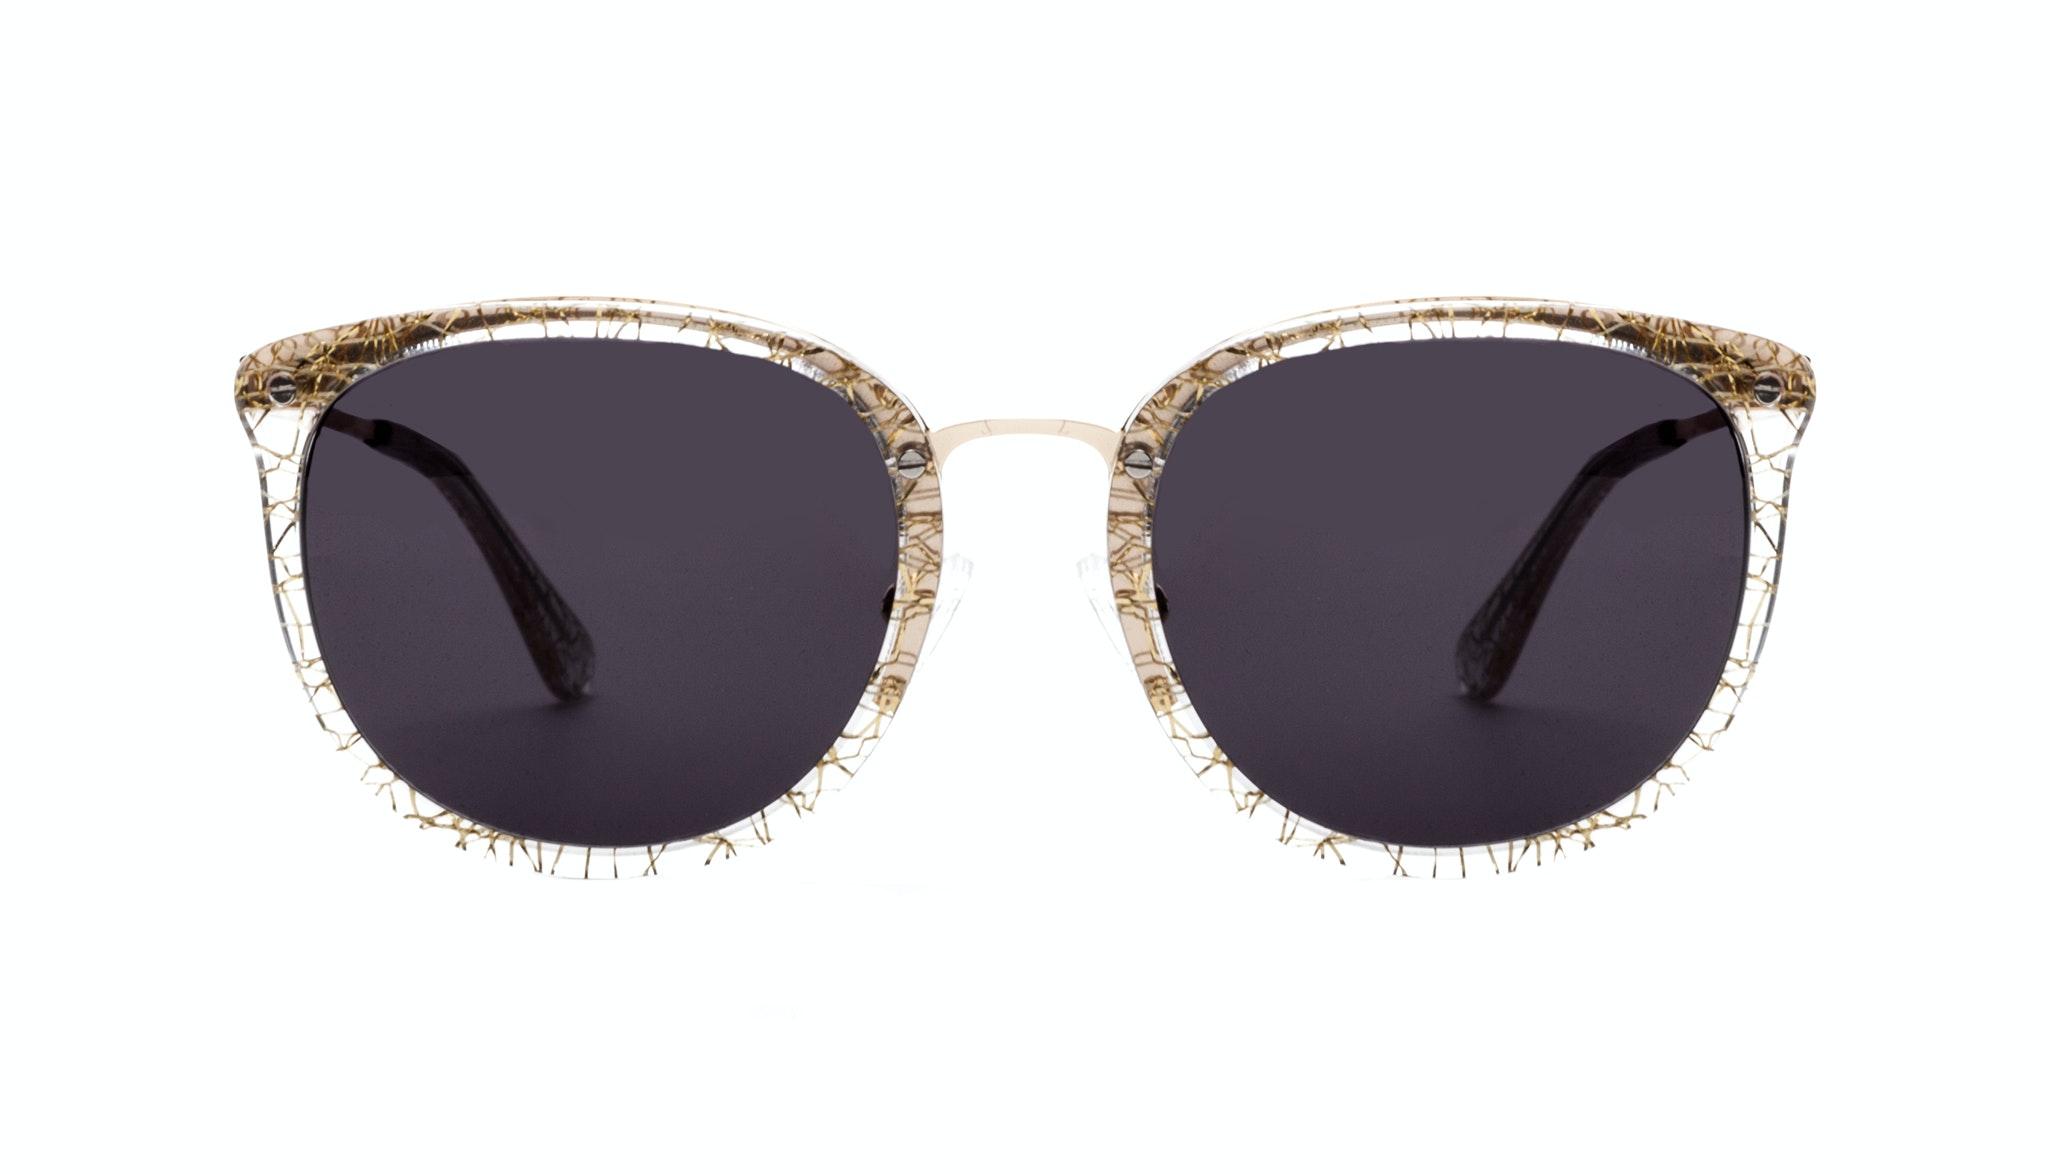 Affordable Fashion Glasses Square Round Sunglasses Women Amaze Champagne